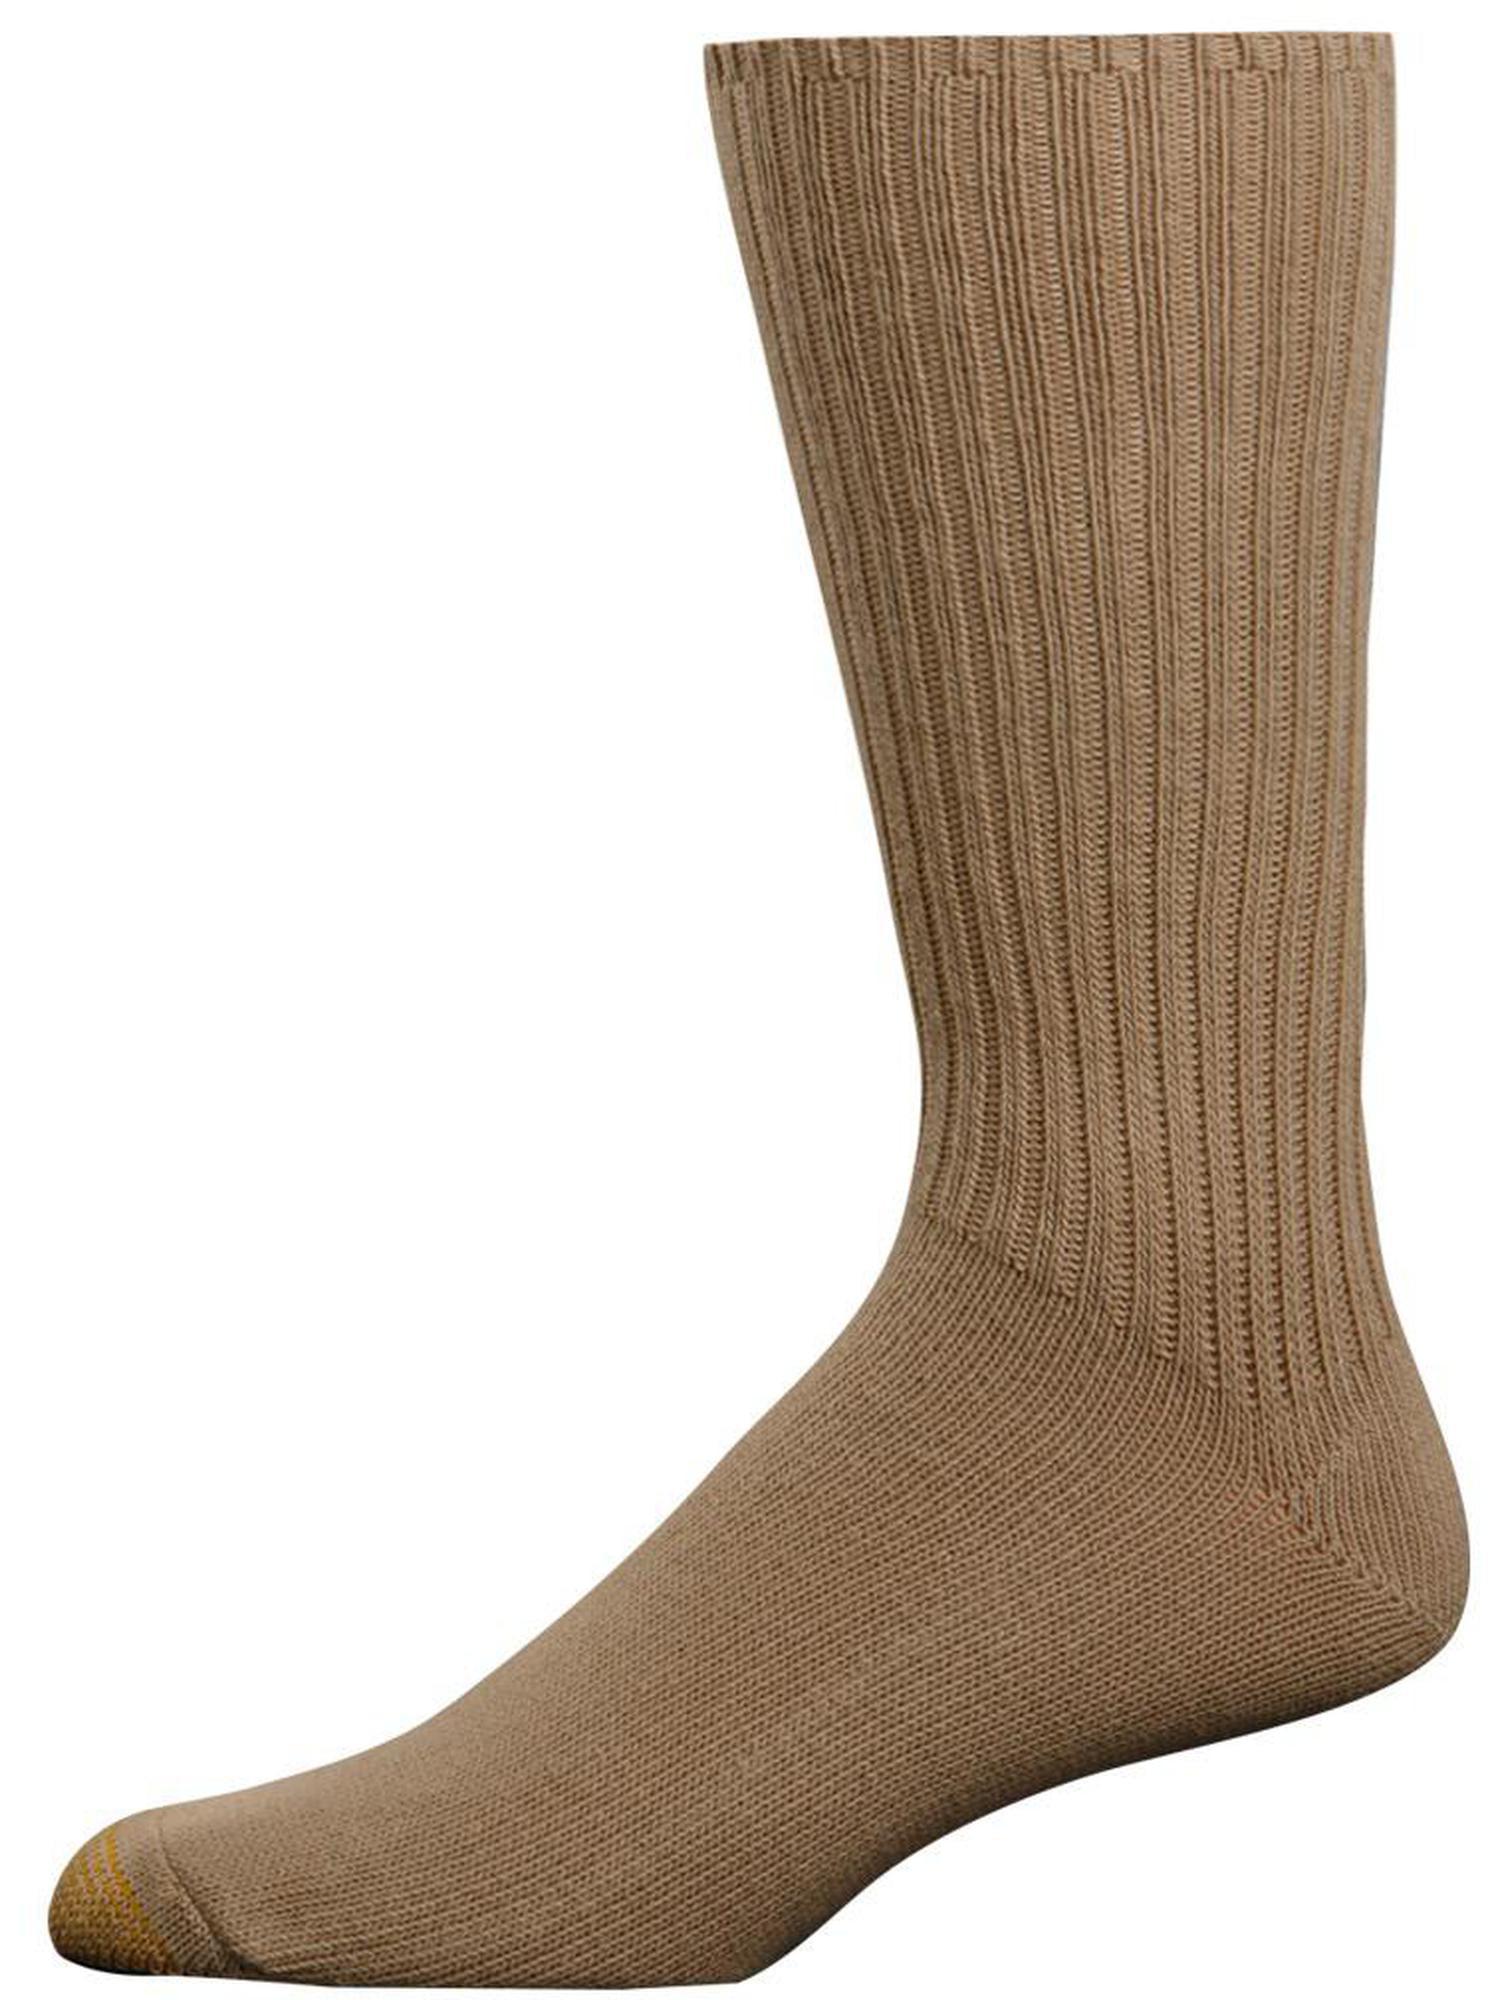 5 Pairs Pack Ladies Socks Black Coloured Toe and Heel Cotton 4-7 CLTK